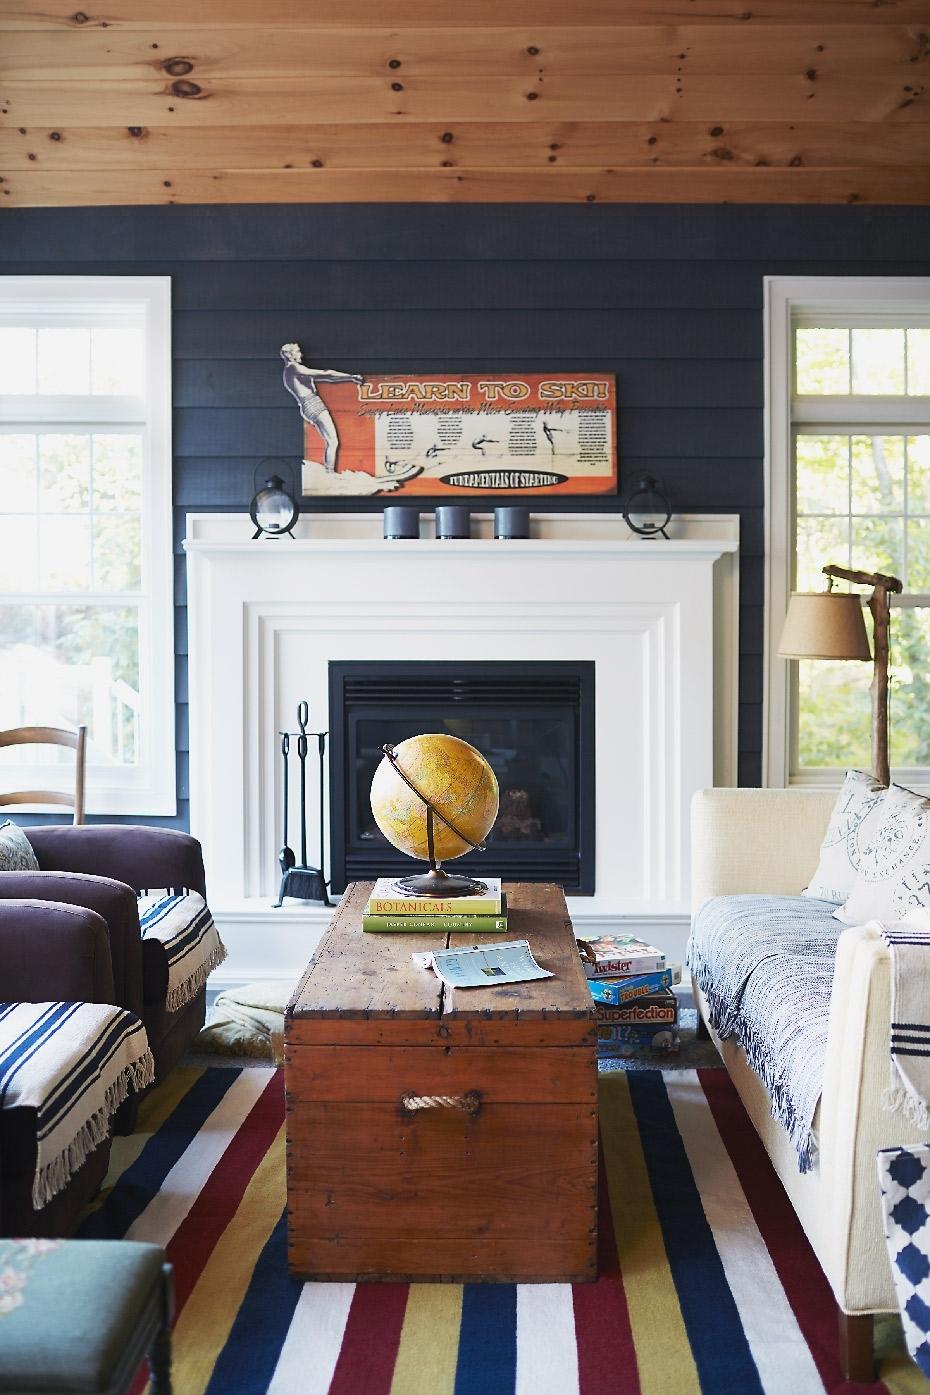 Stacey Van Berkel Photography I Lake house interior I Muskoka I Canada I Shot for Style at Home Magazine